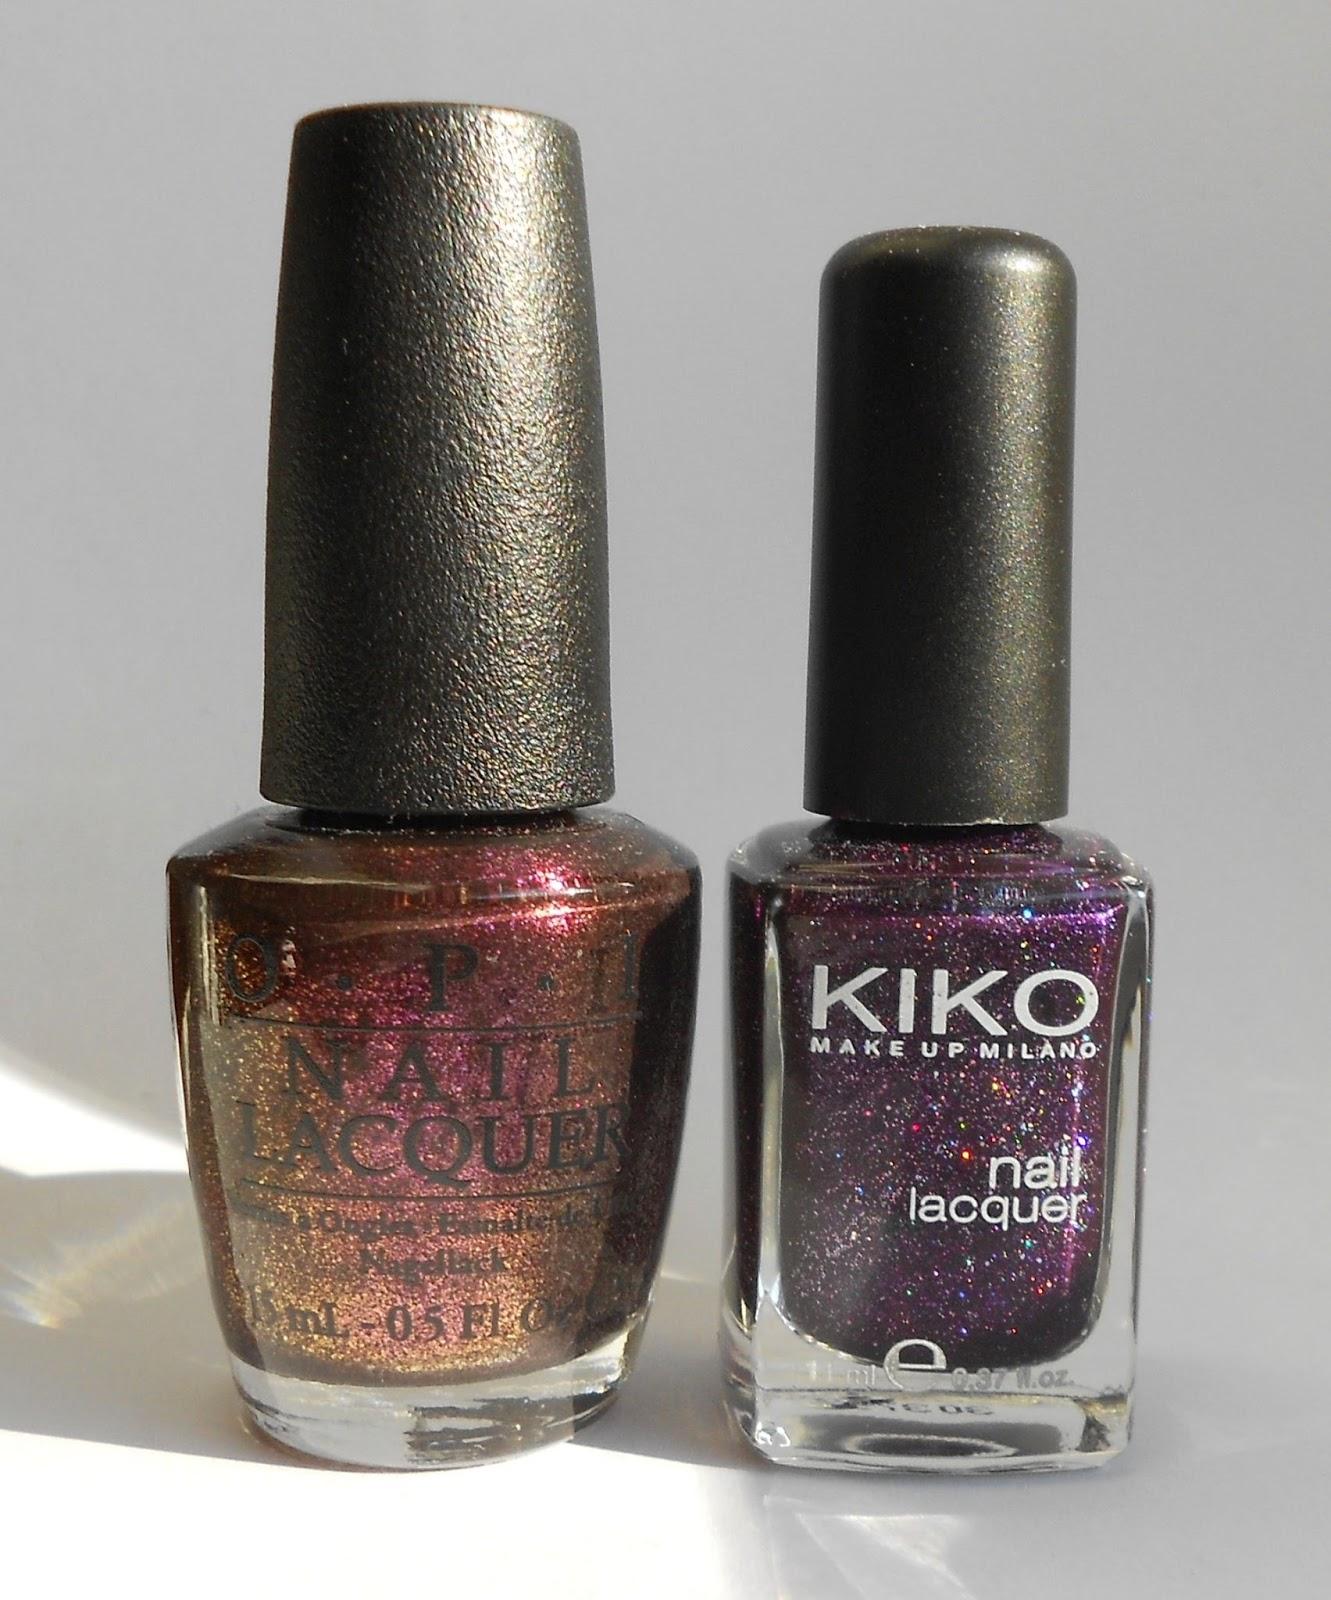 OPI Drive me wild Kiko Violet Microglitter